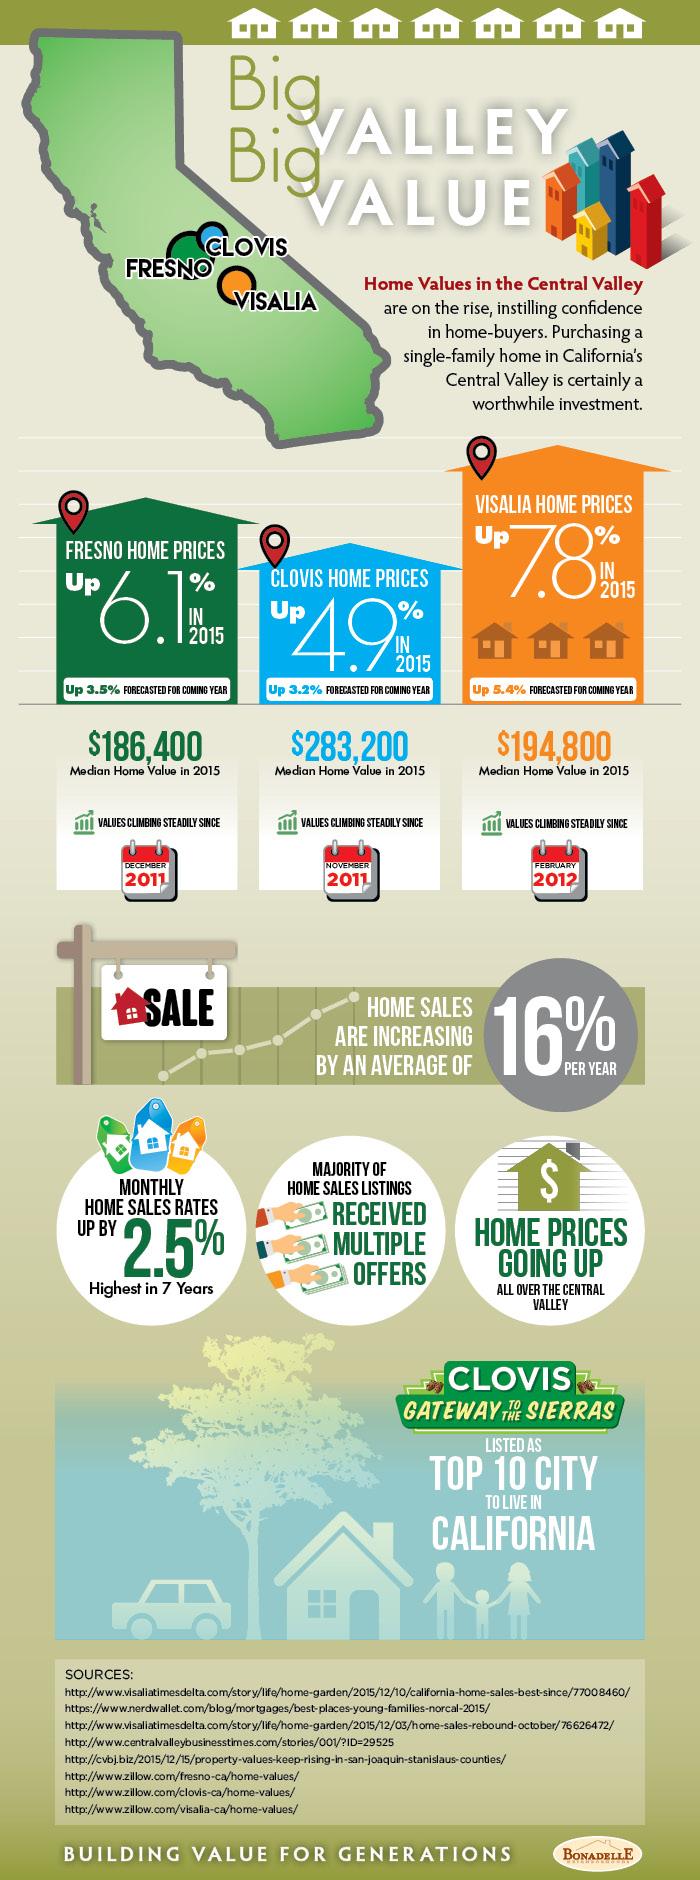 Big-Valley-Big-Value-infographic